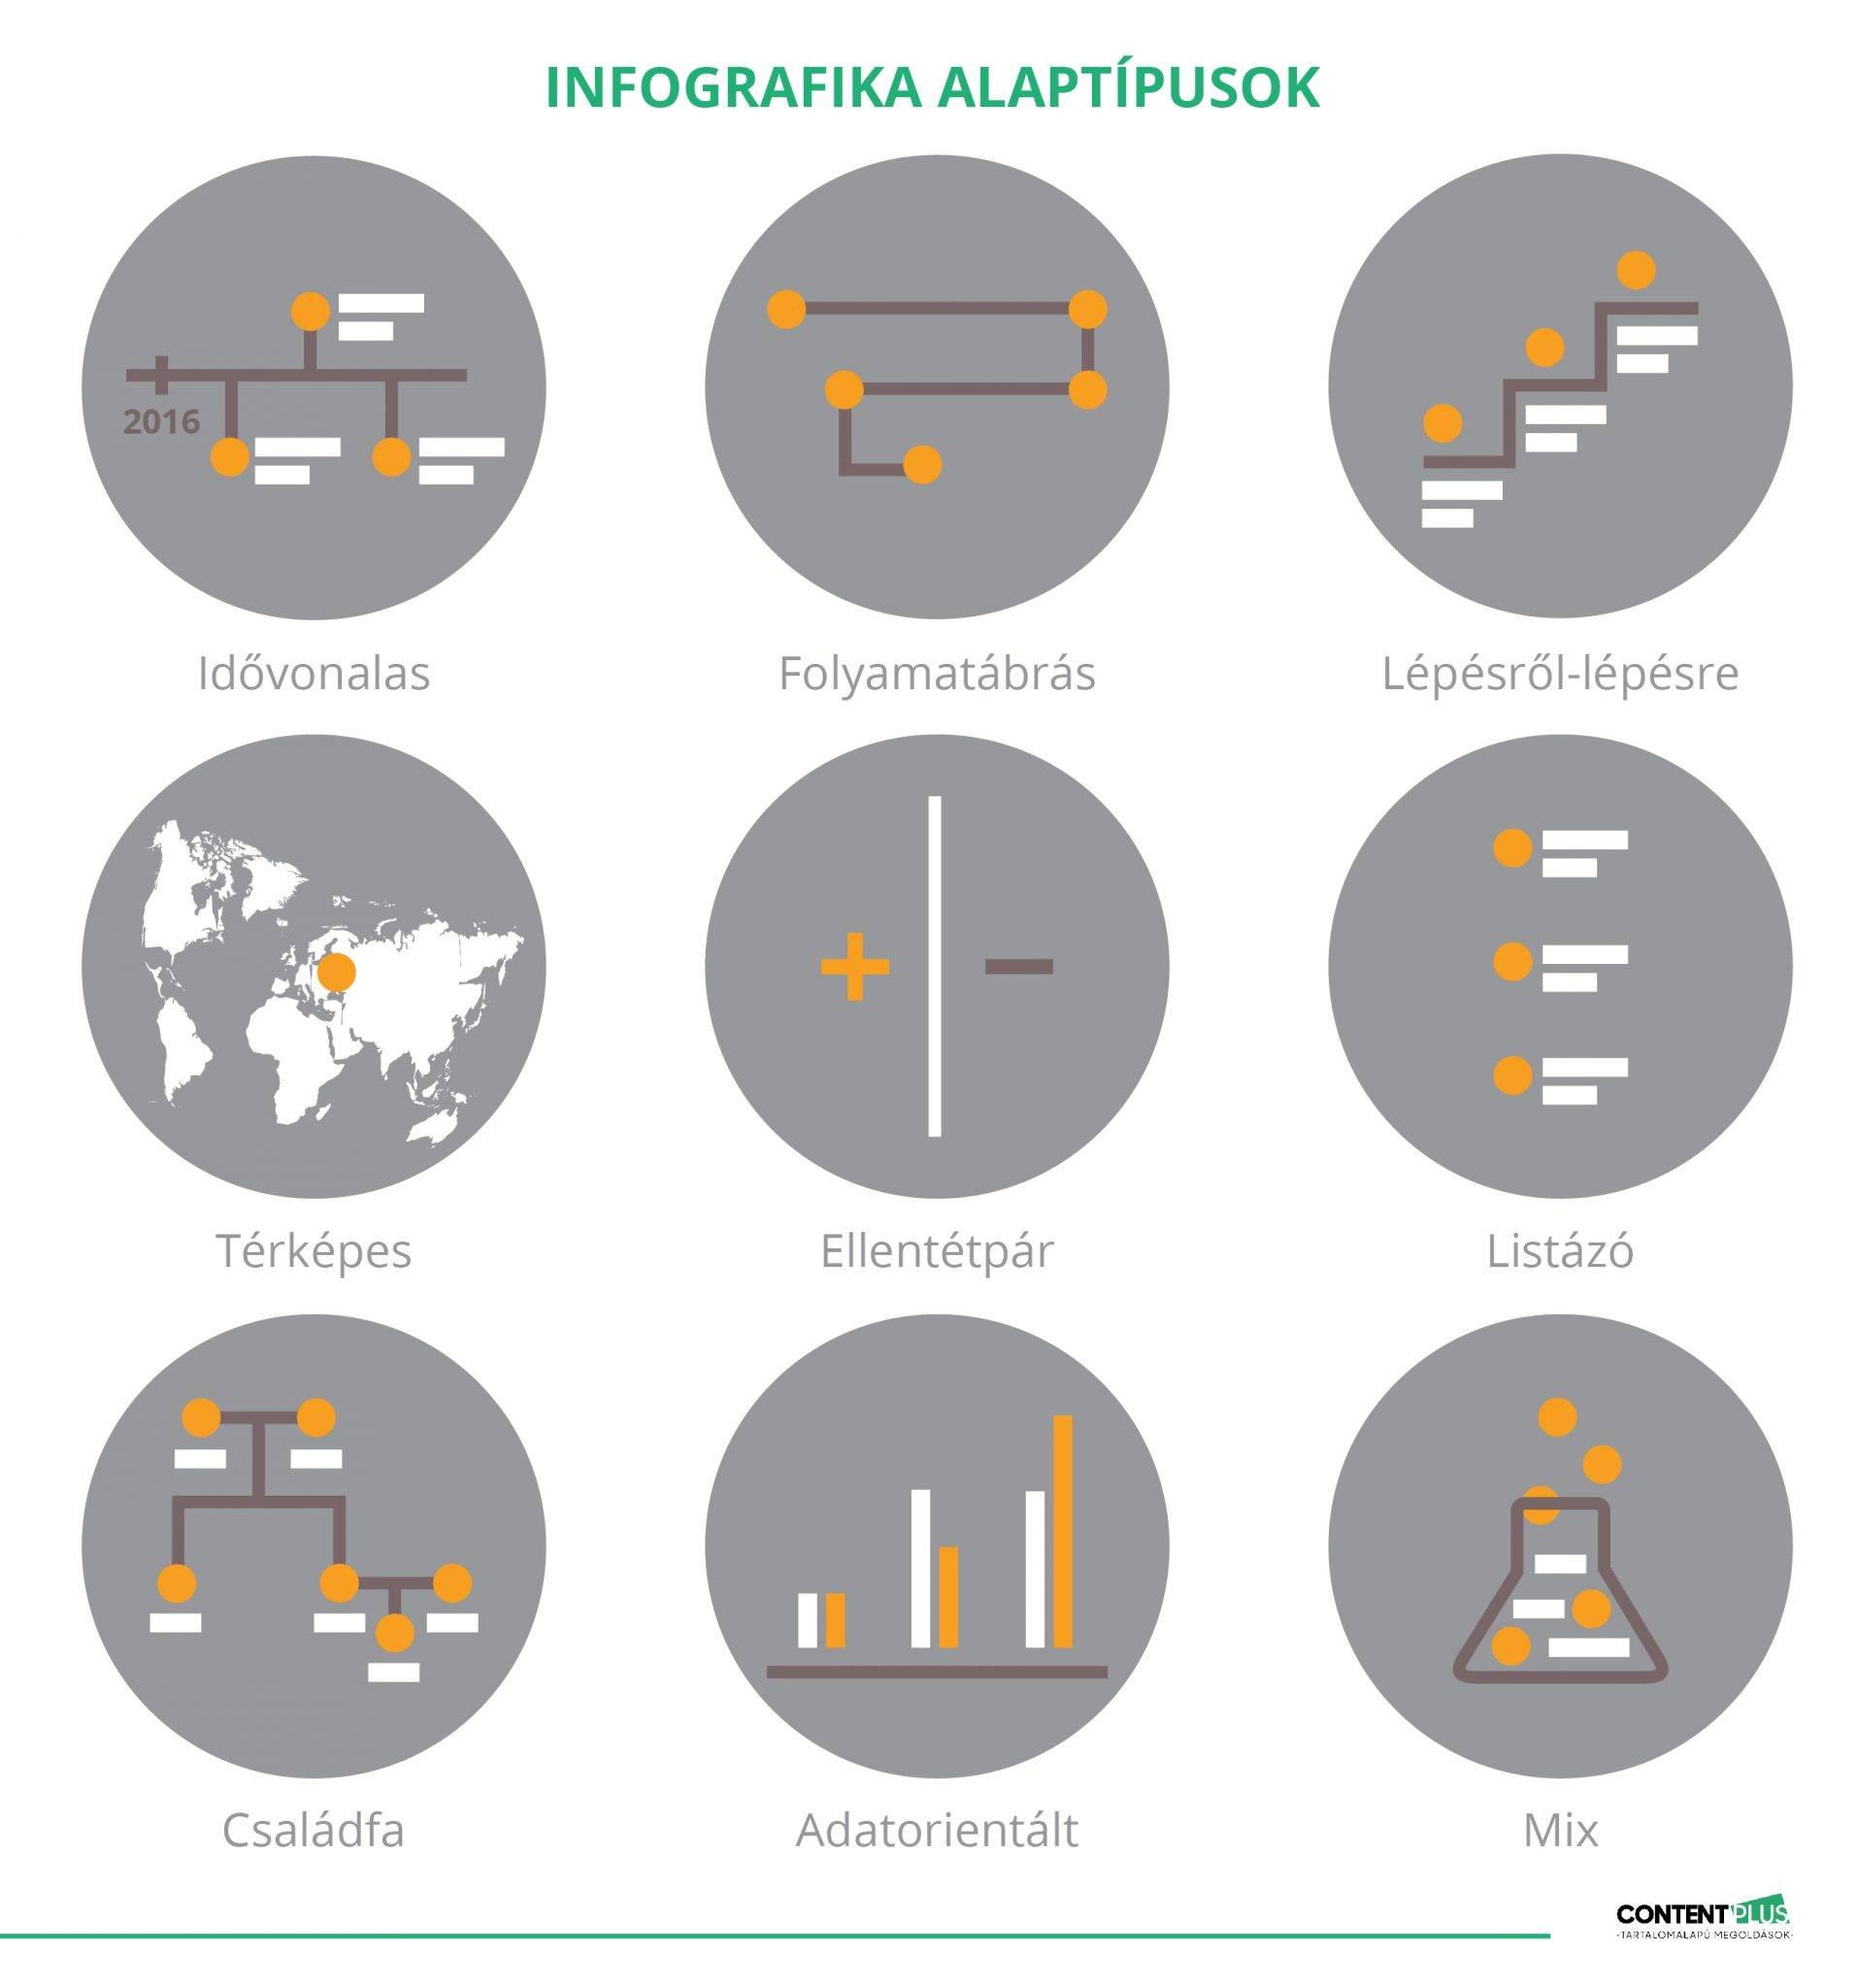 9 darab infografika-alaptípus